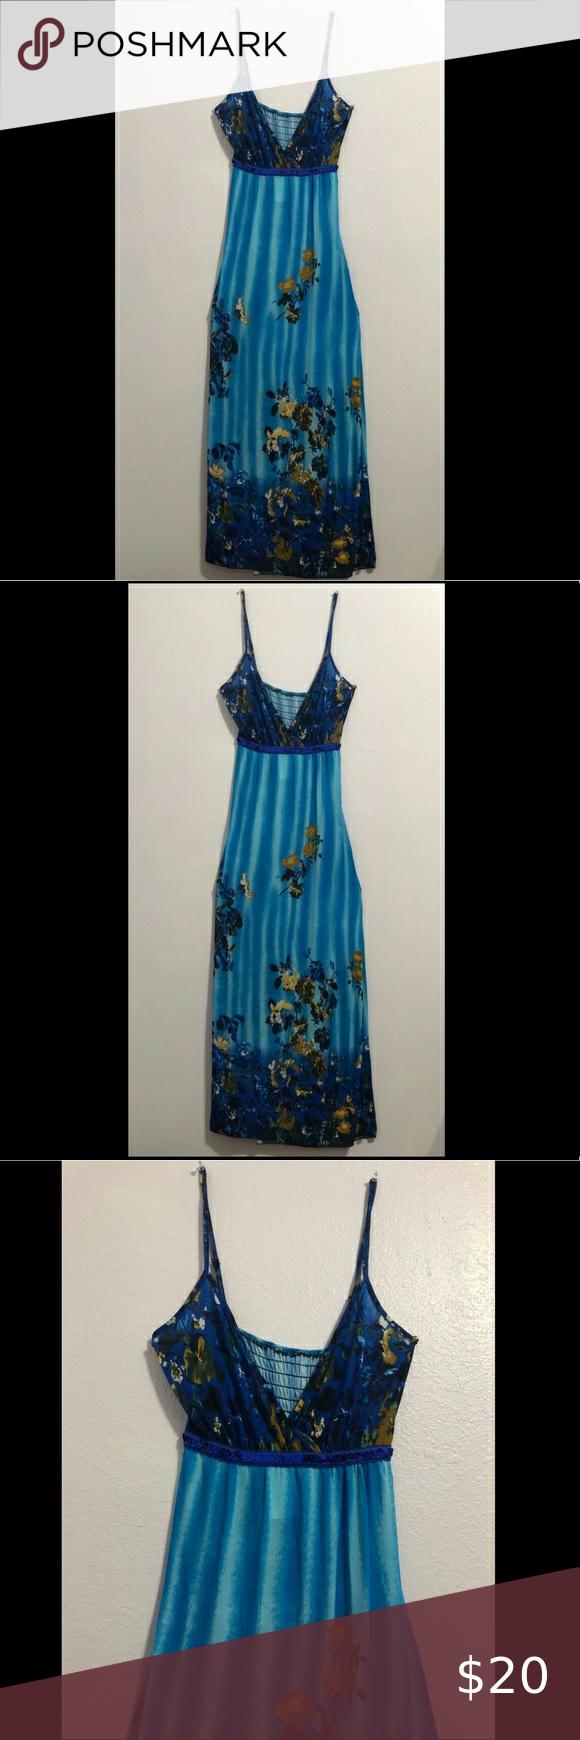 Si Rou Summer Dress Summer Dresses Stretchy Dress Nice Dresses [ 1740 x 580 Pixel ]